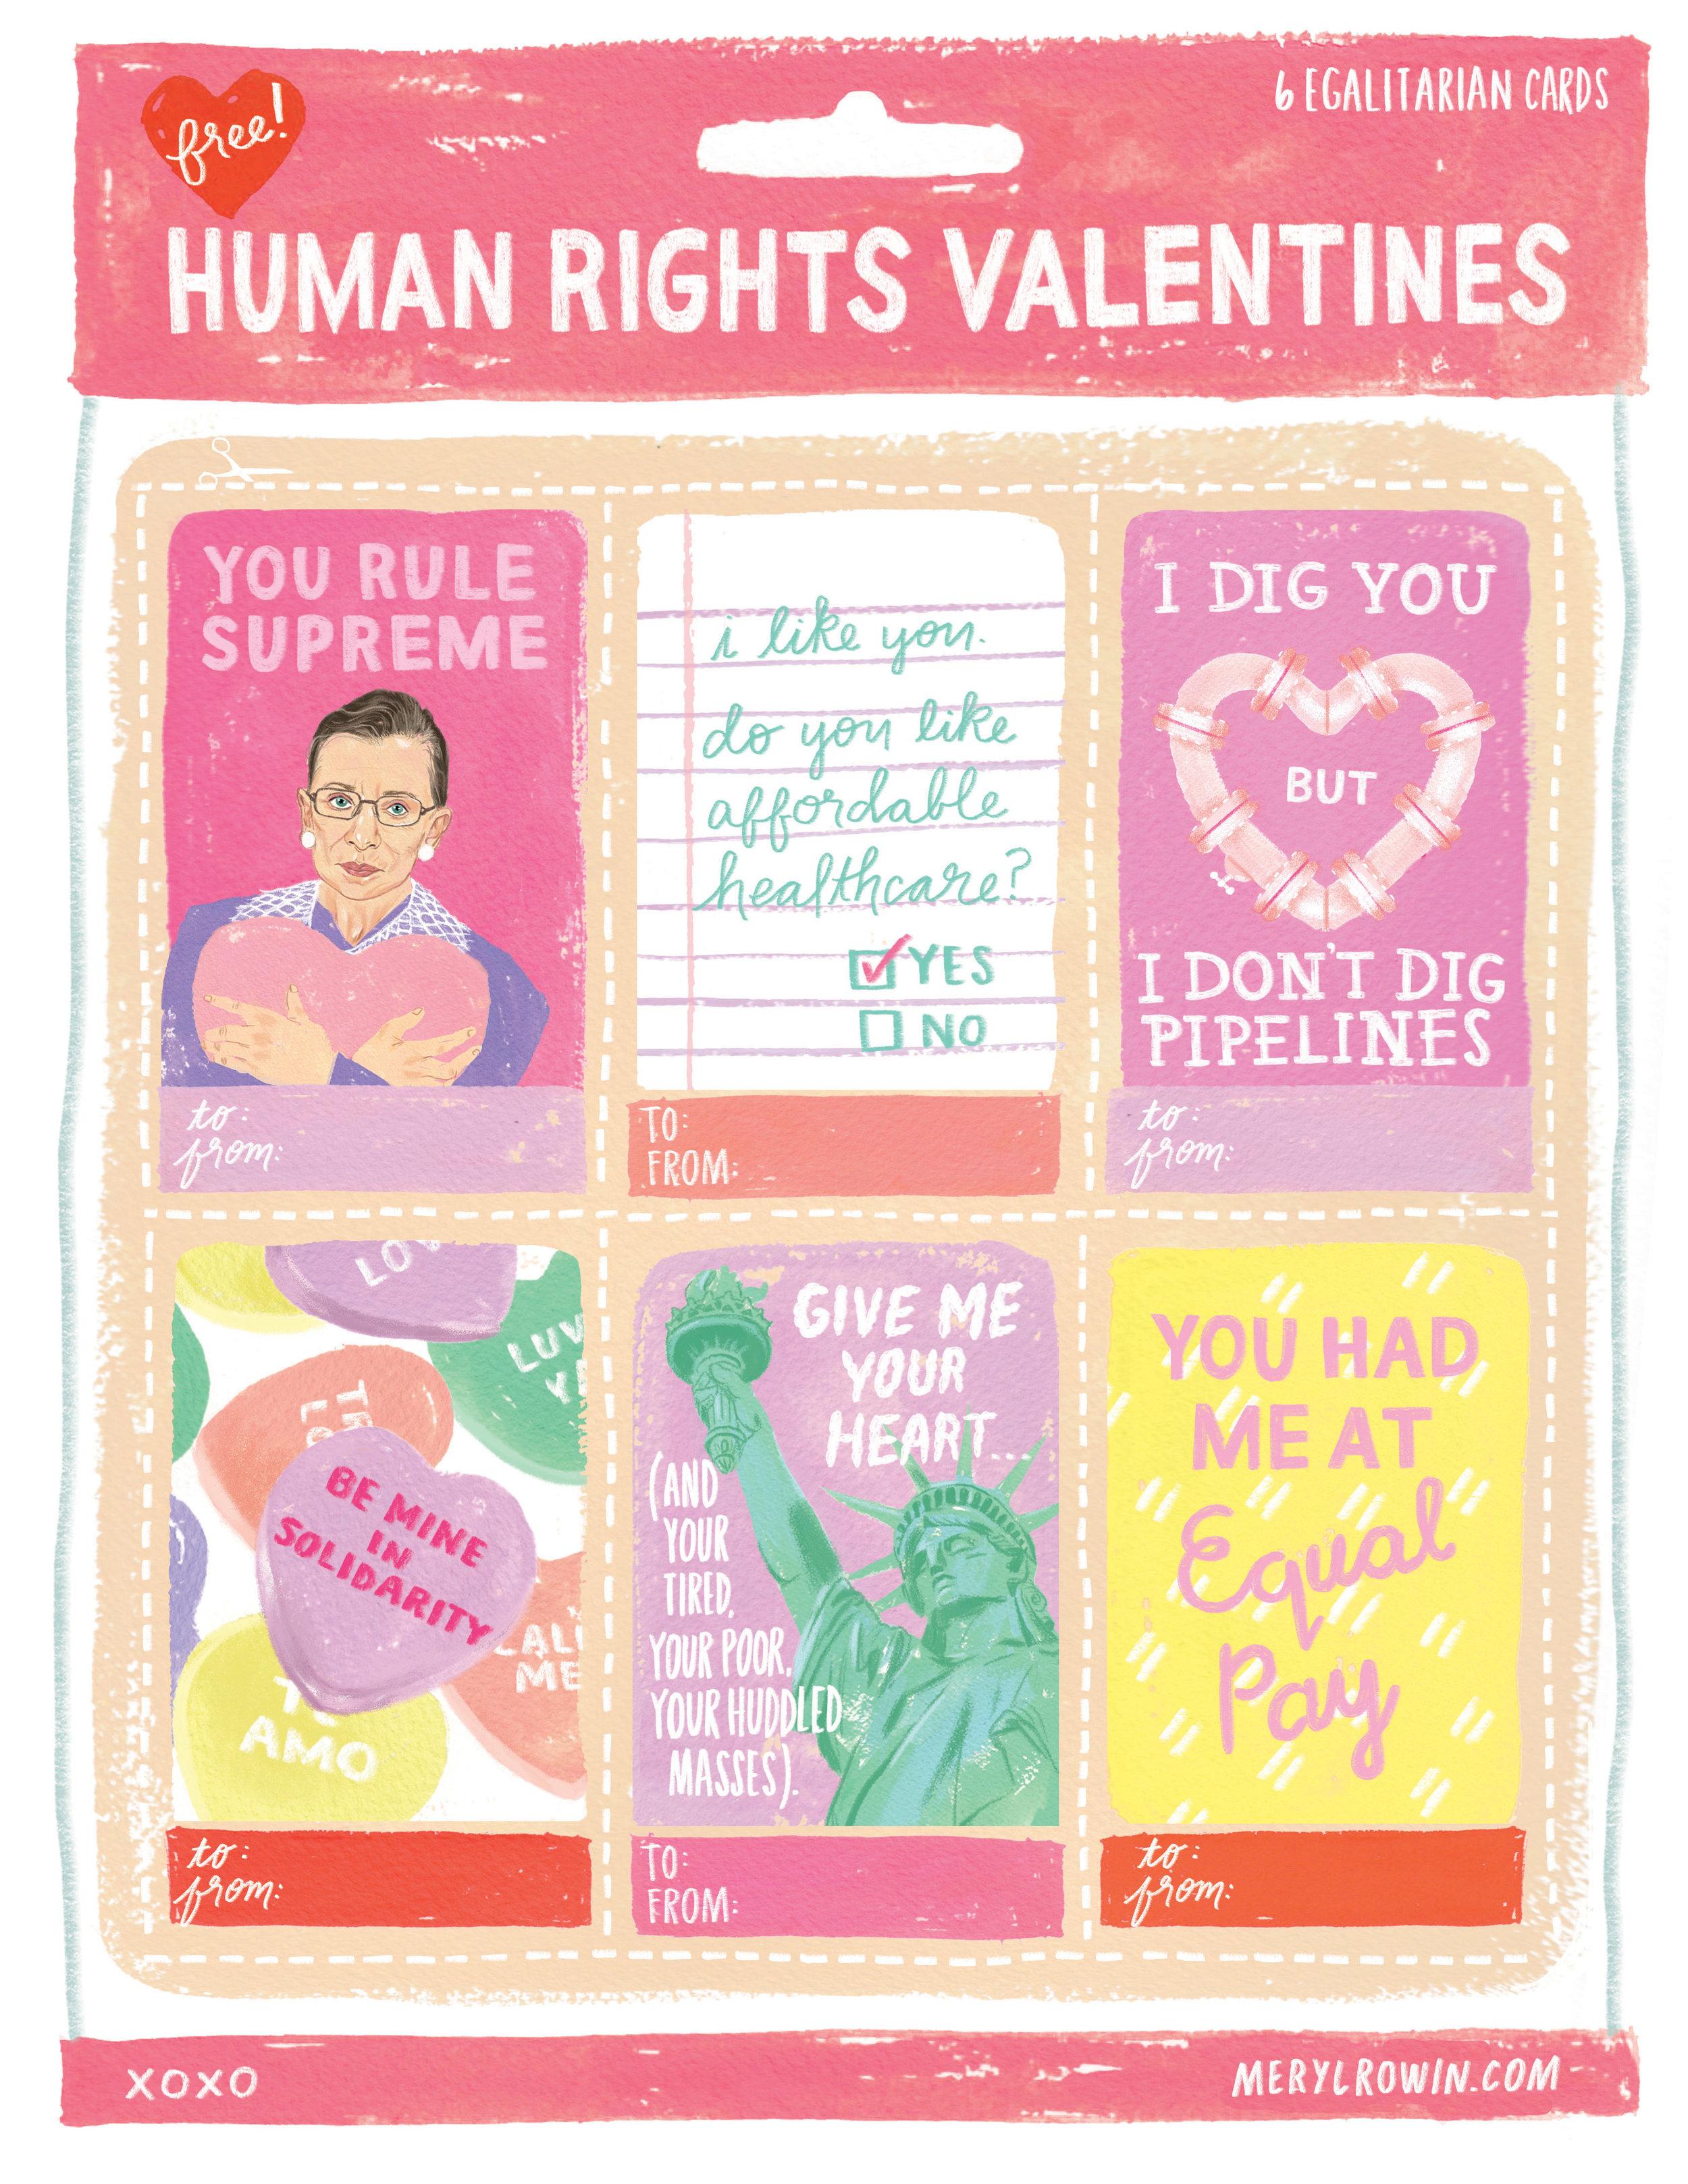 HUMAN RIGHTS VALENTINES_LENNY LETTER_RGB.jpg